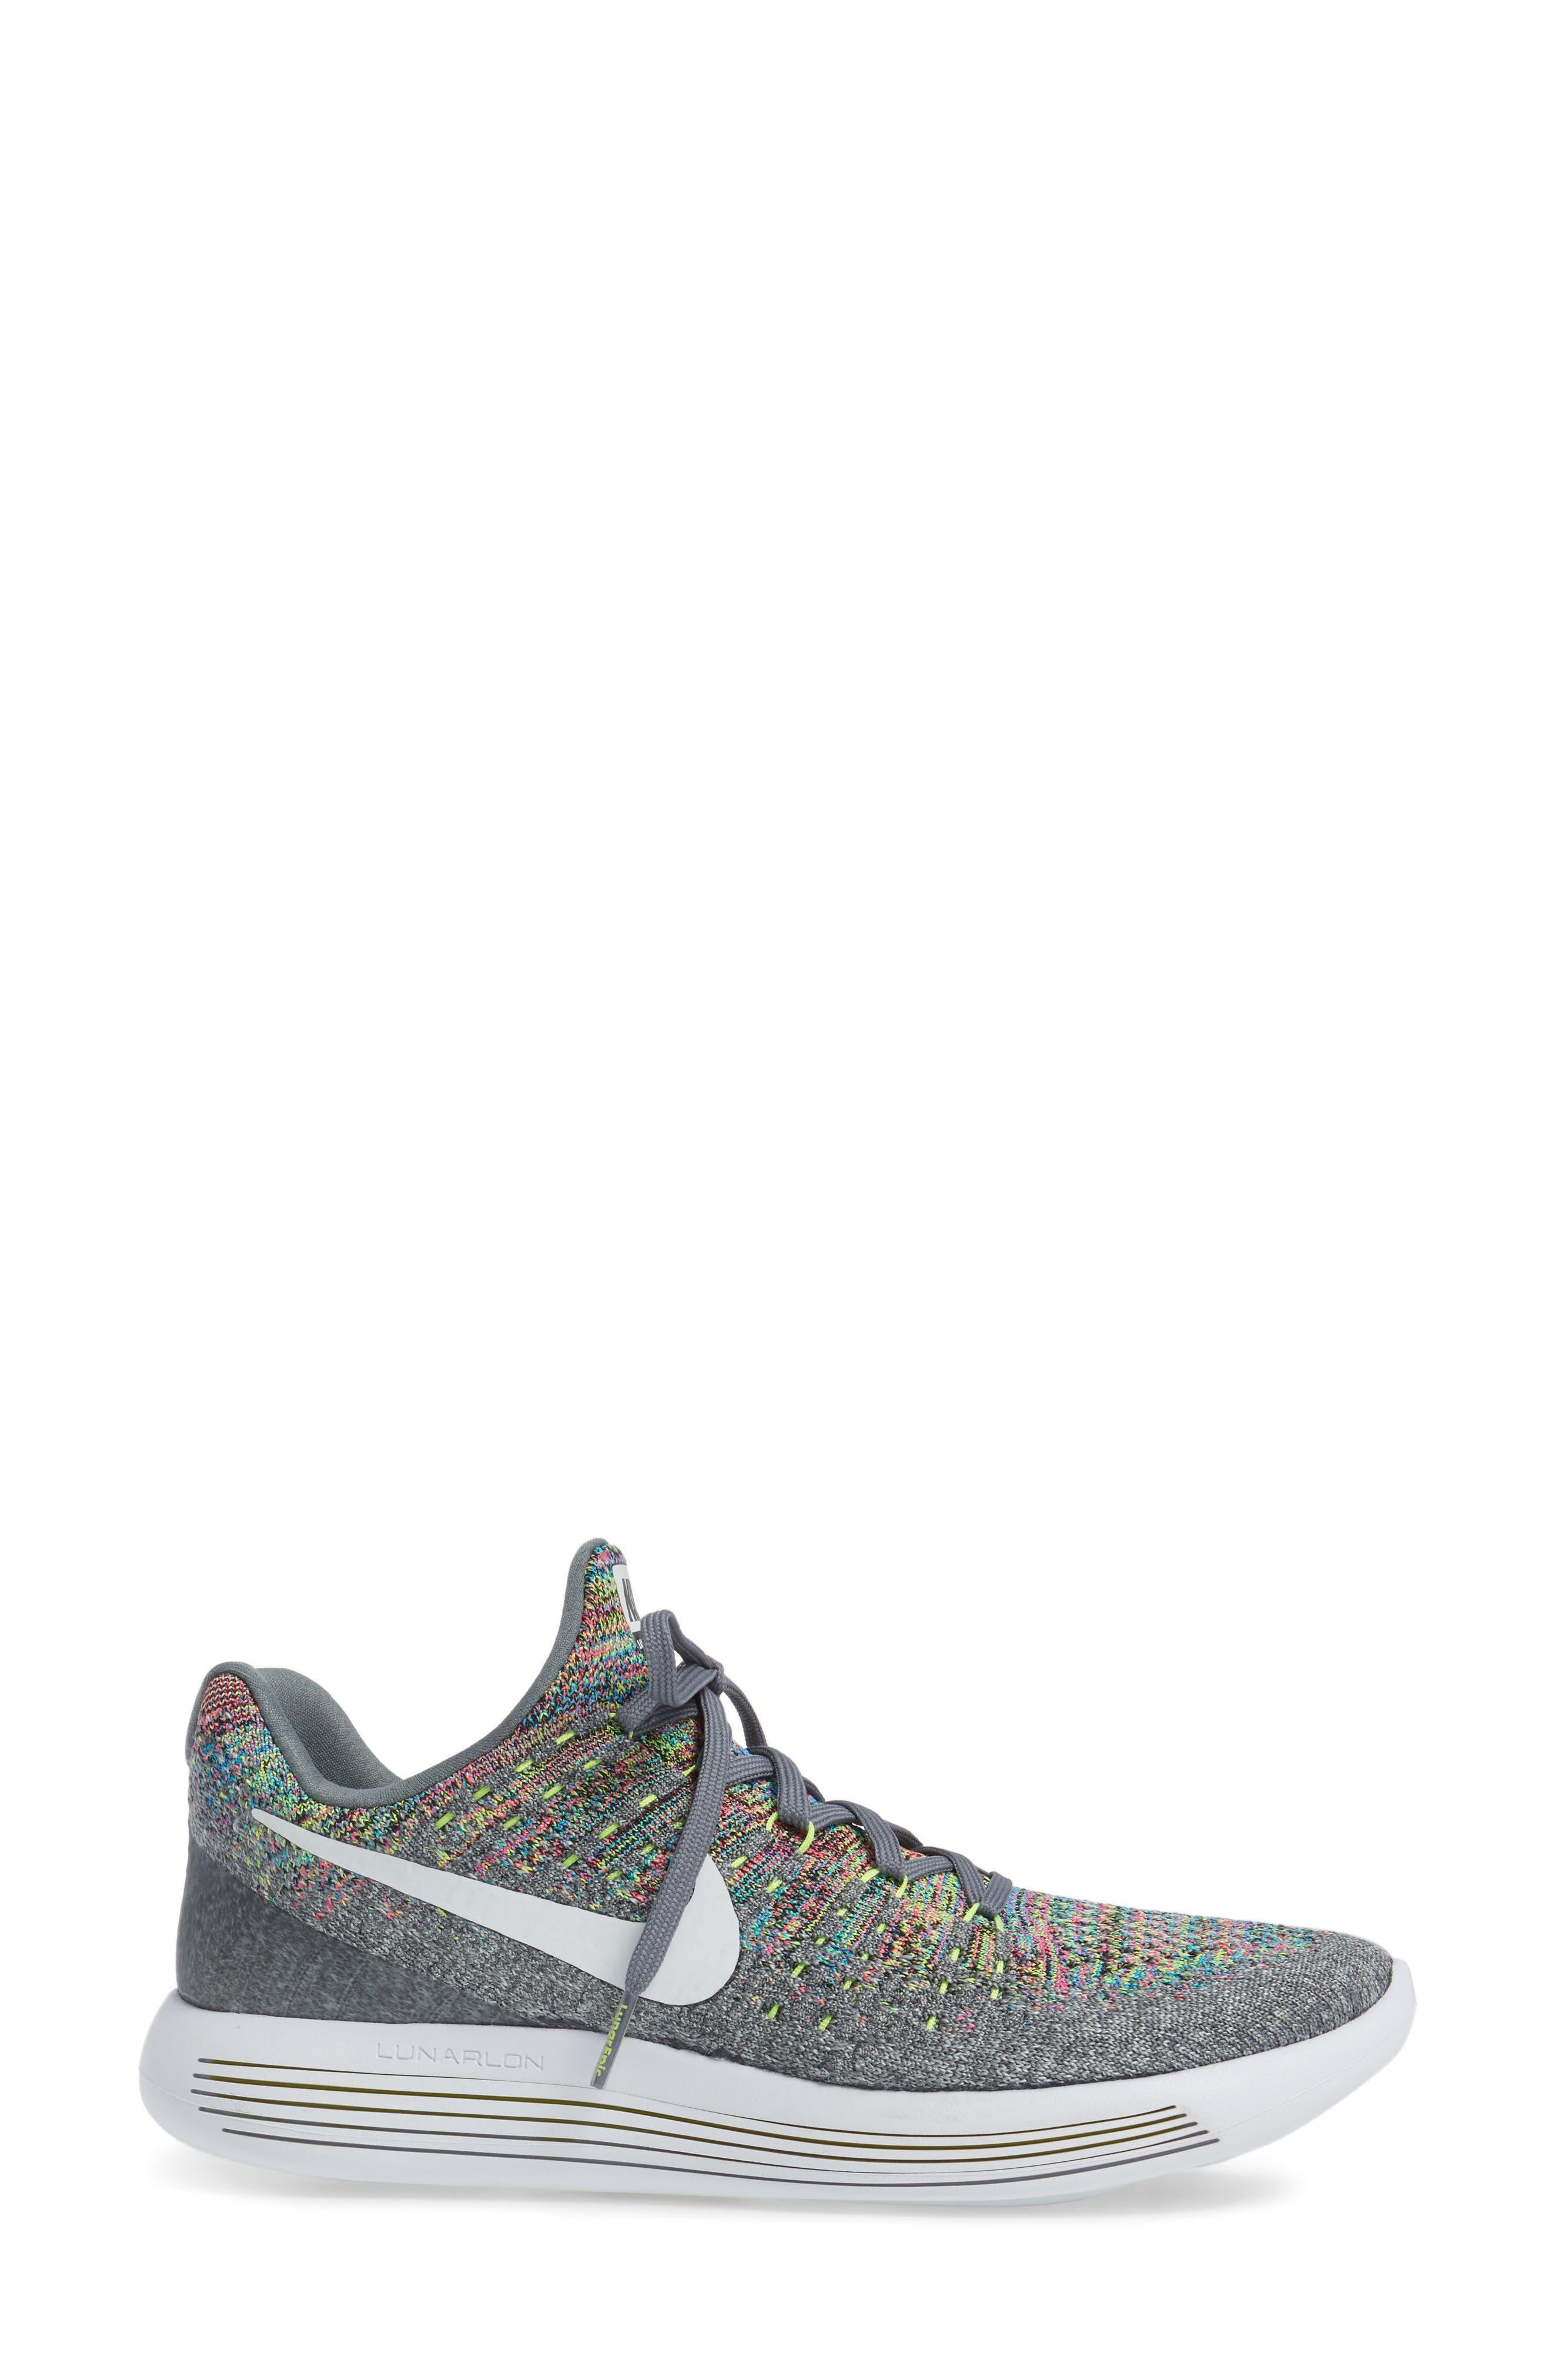 LunarEpic Low Flyknit 2 Running Shoe,                             Alternate thumbnail 50, color,